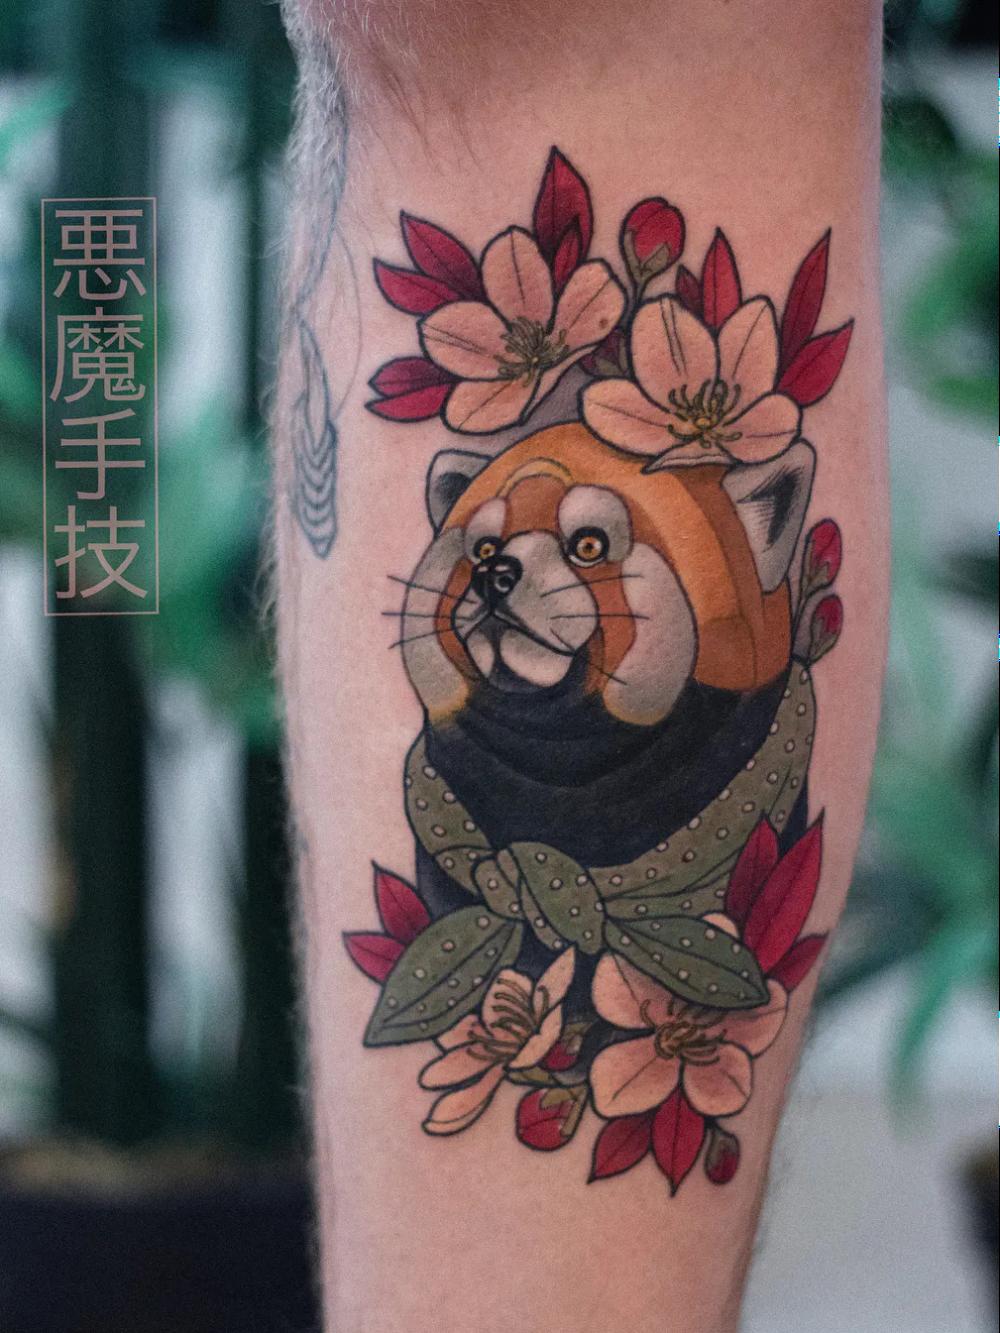 Tattoo uploaded by Tattoodo Cherry blossom tattoo by